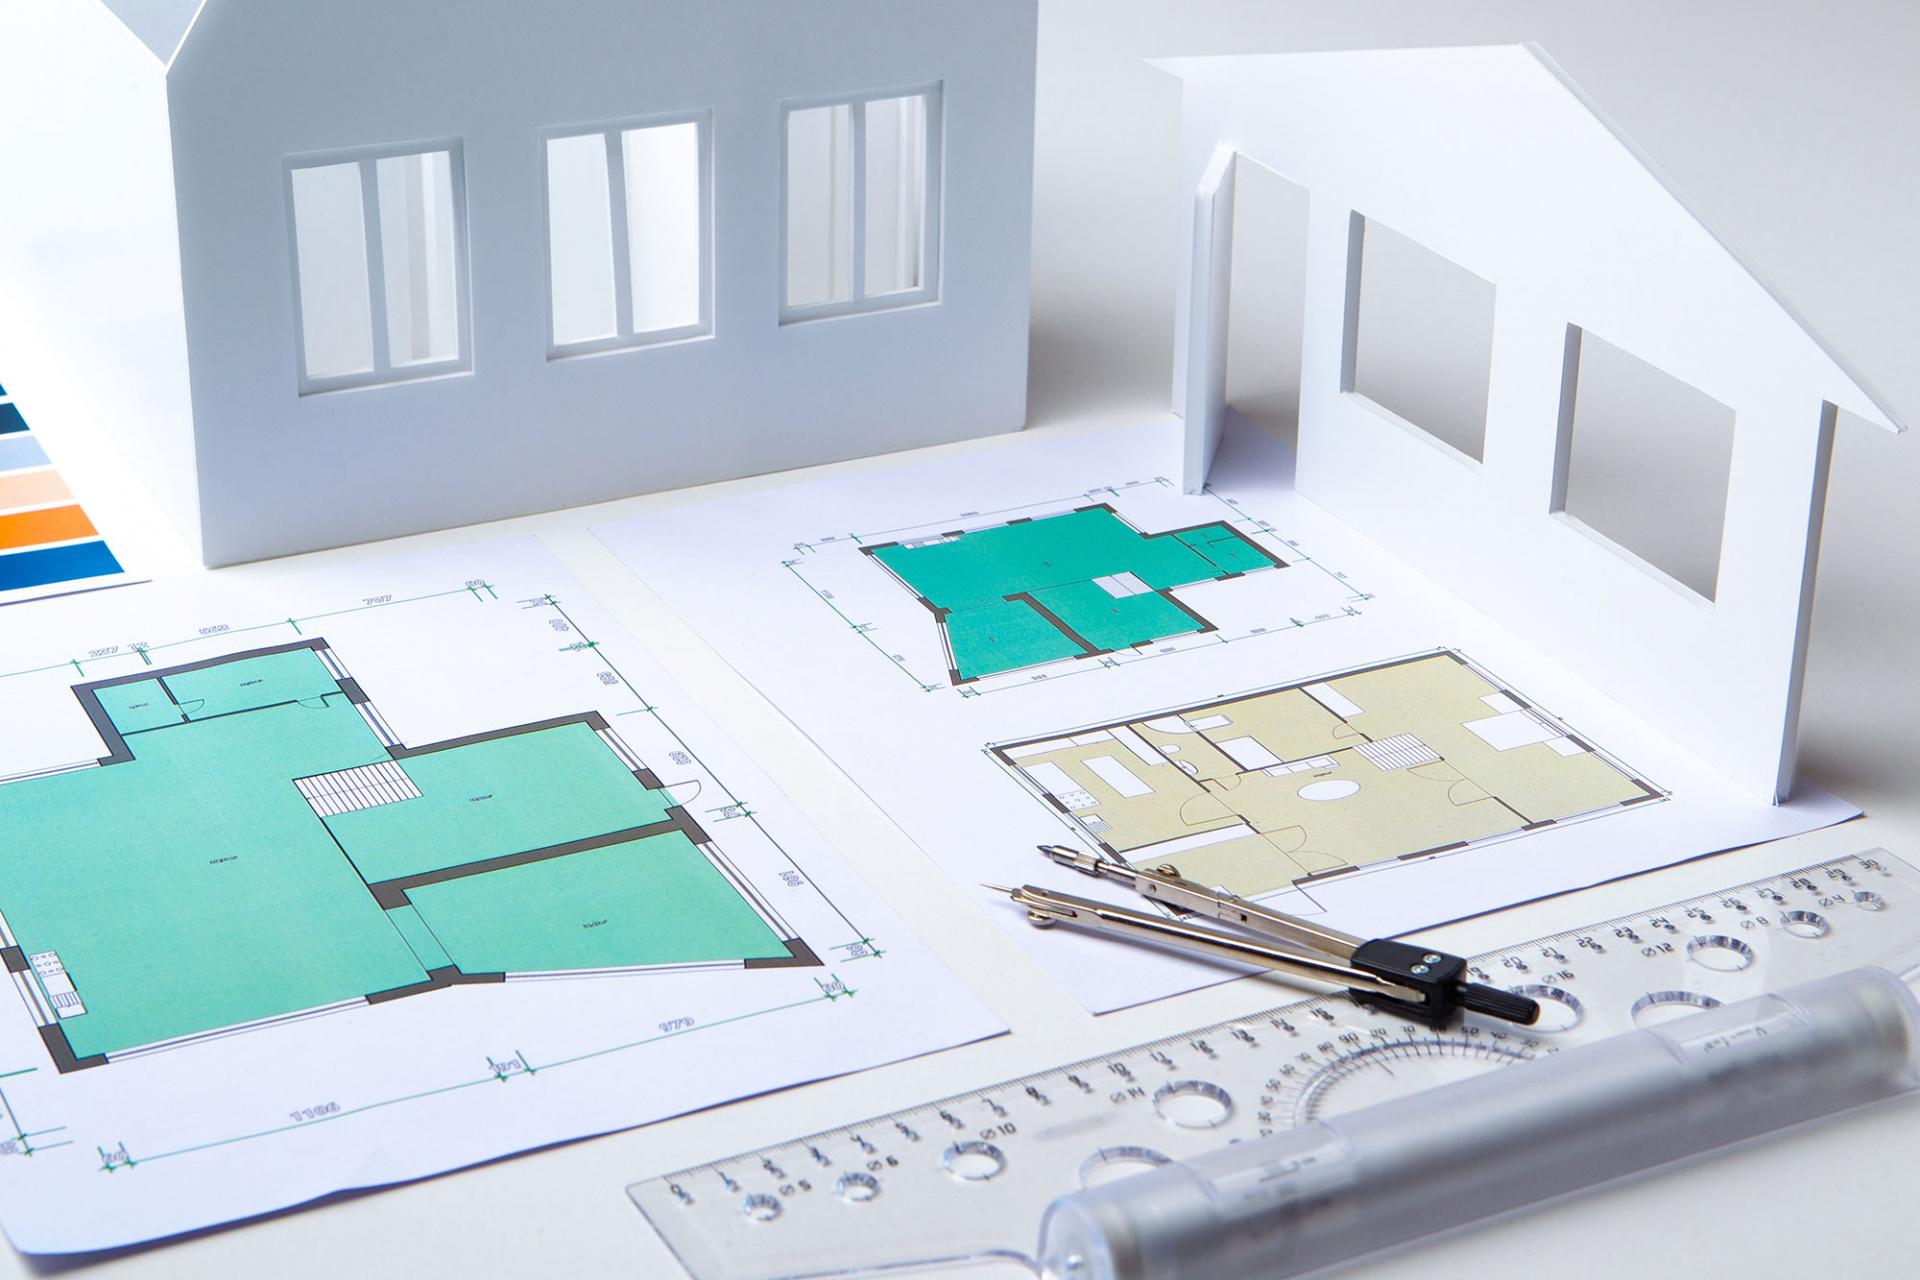 planning permission outline uk